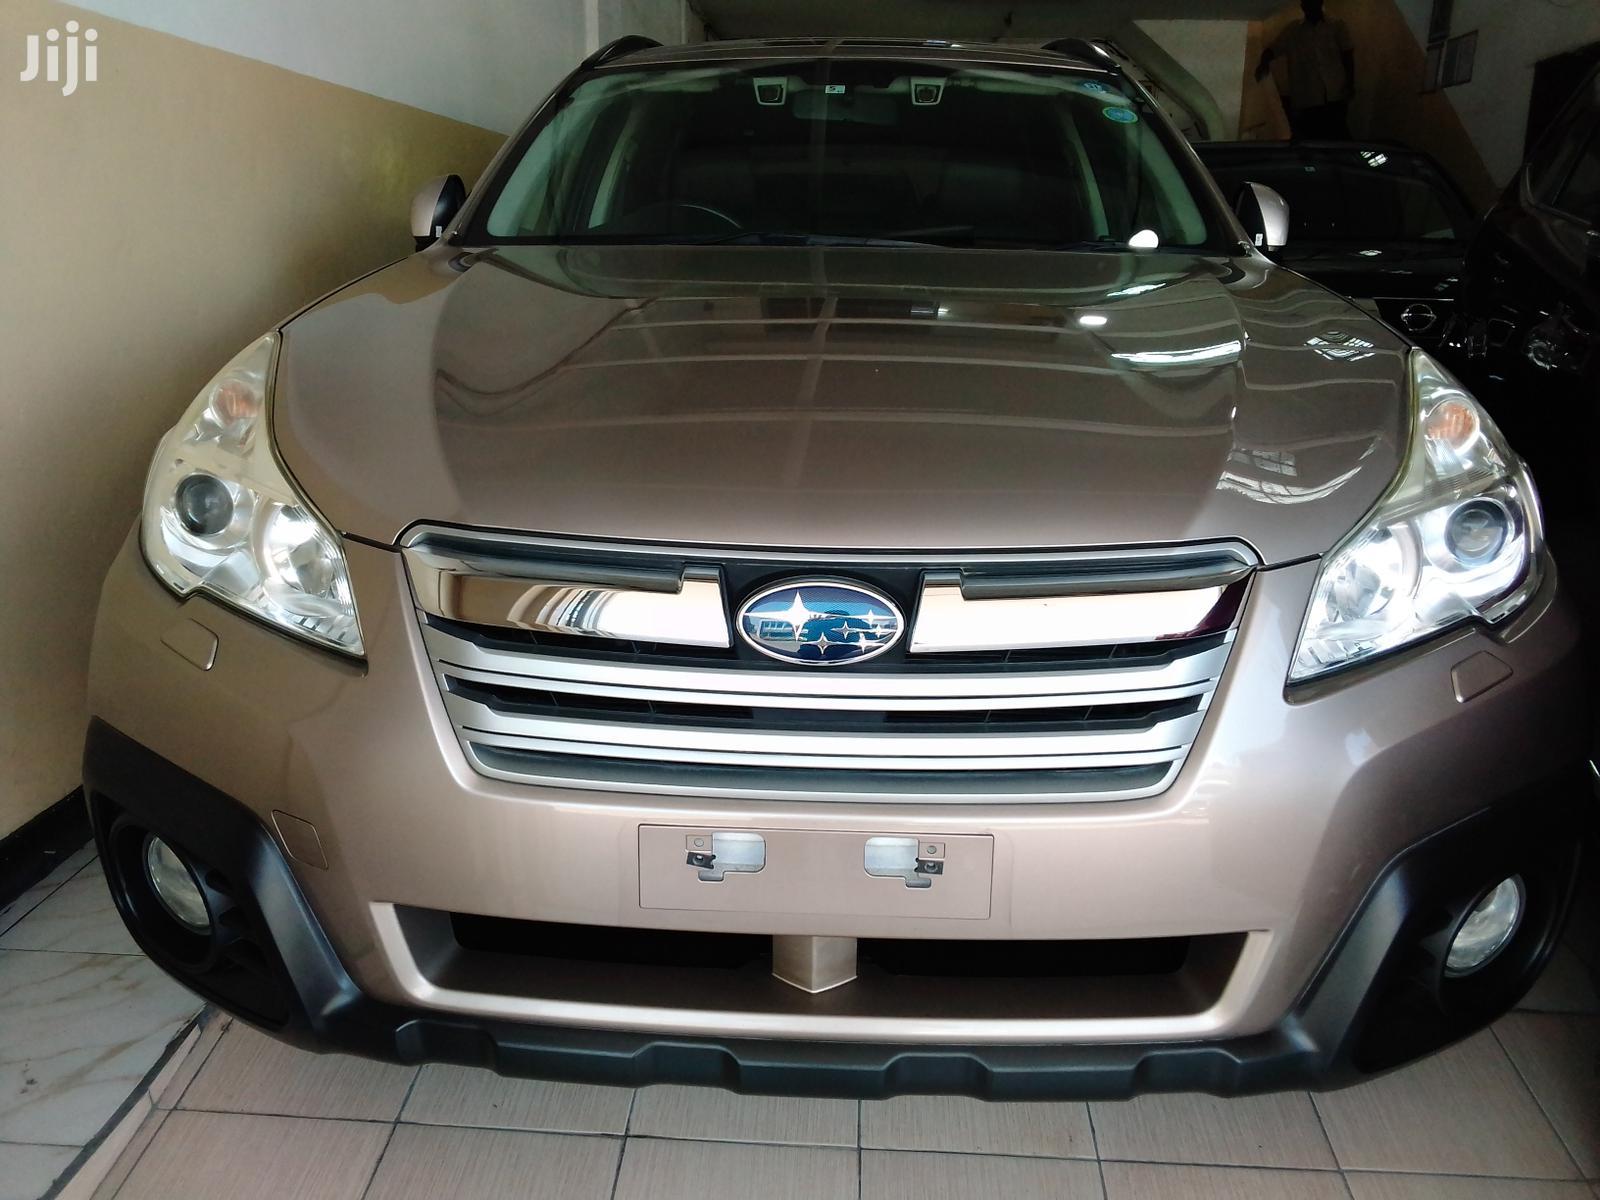 Subaru Outback 2013 Gold | Cars for sale in Mvita, Mombasa, Kenya